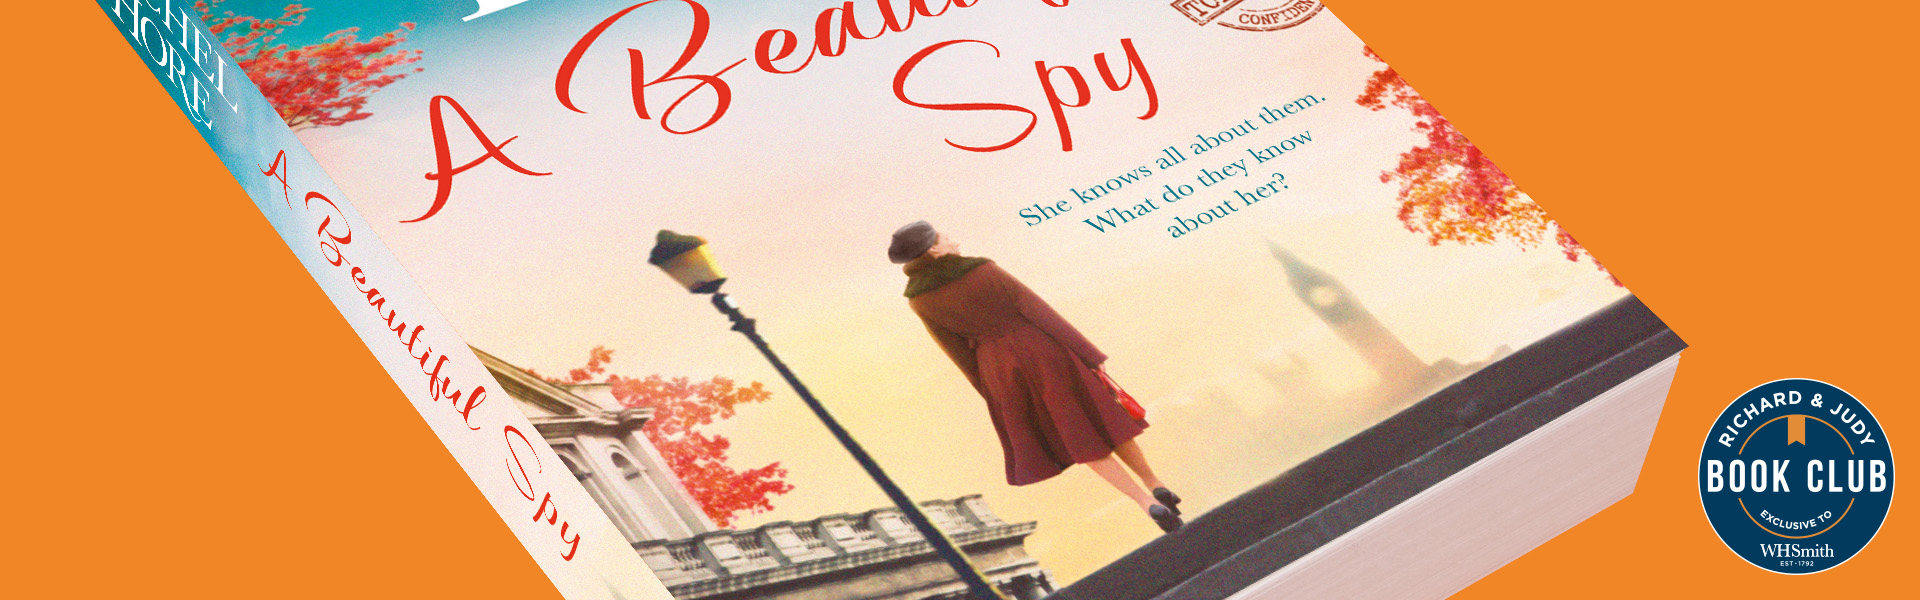 Richard & Judy Introduce A Beautiful Spy by Rachel Hore